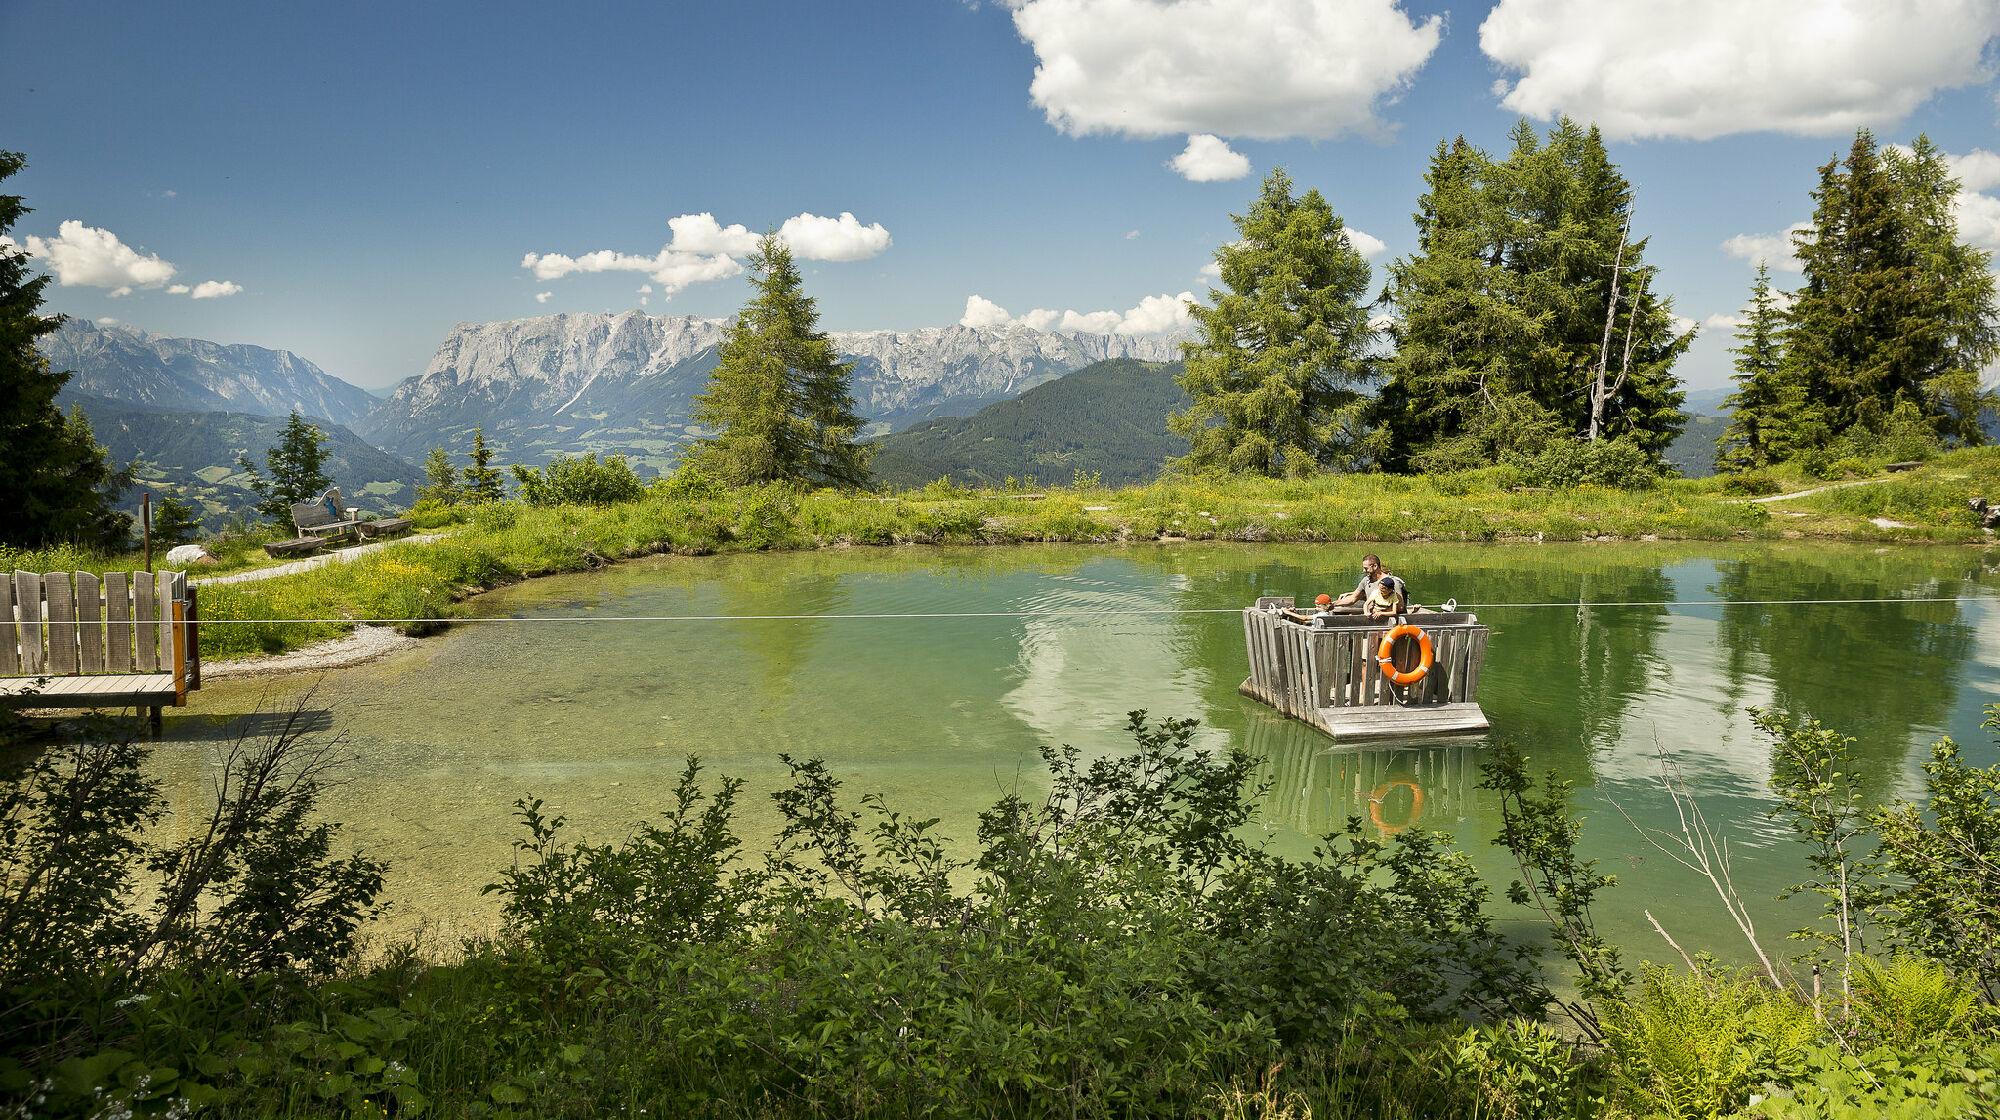 Floß am Geisterberg Alpendorf